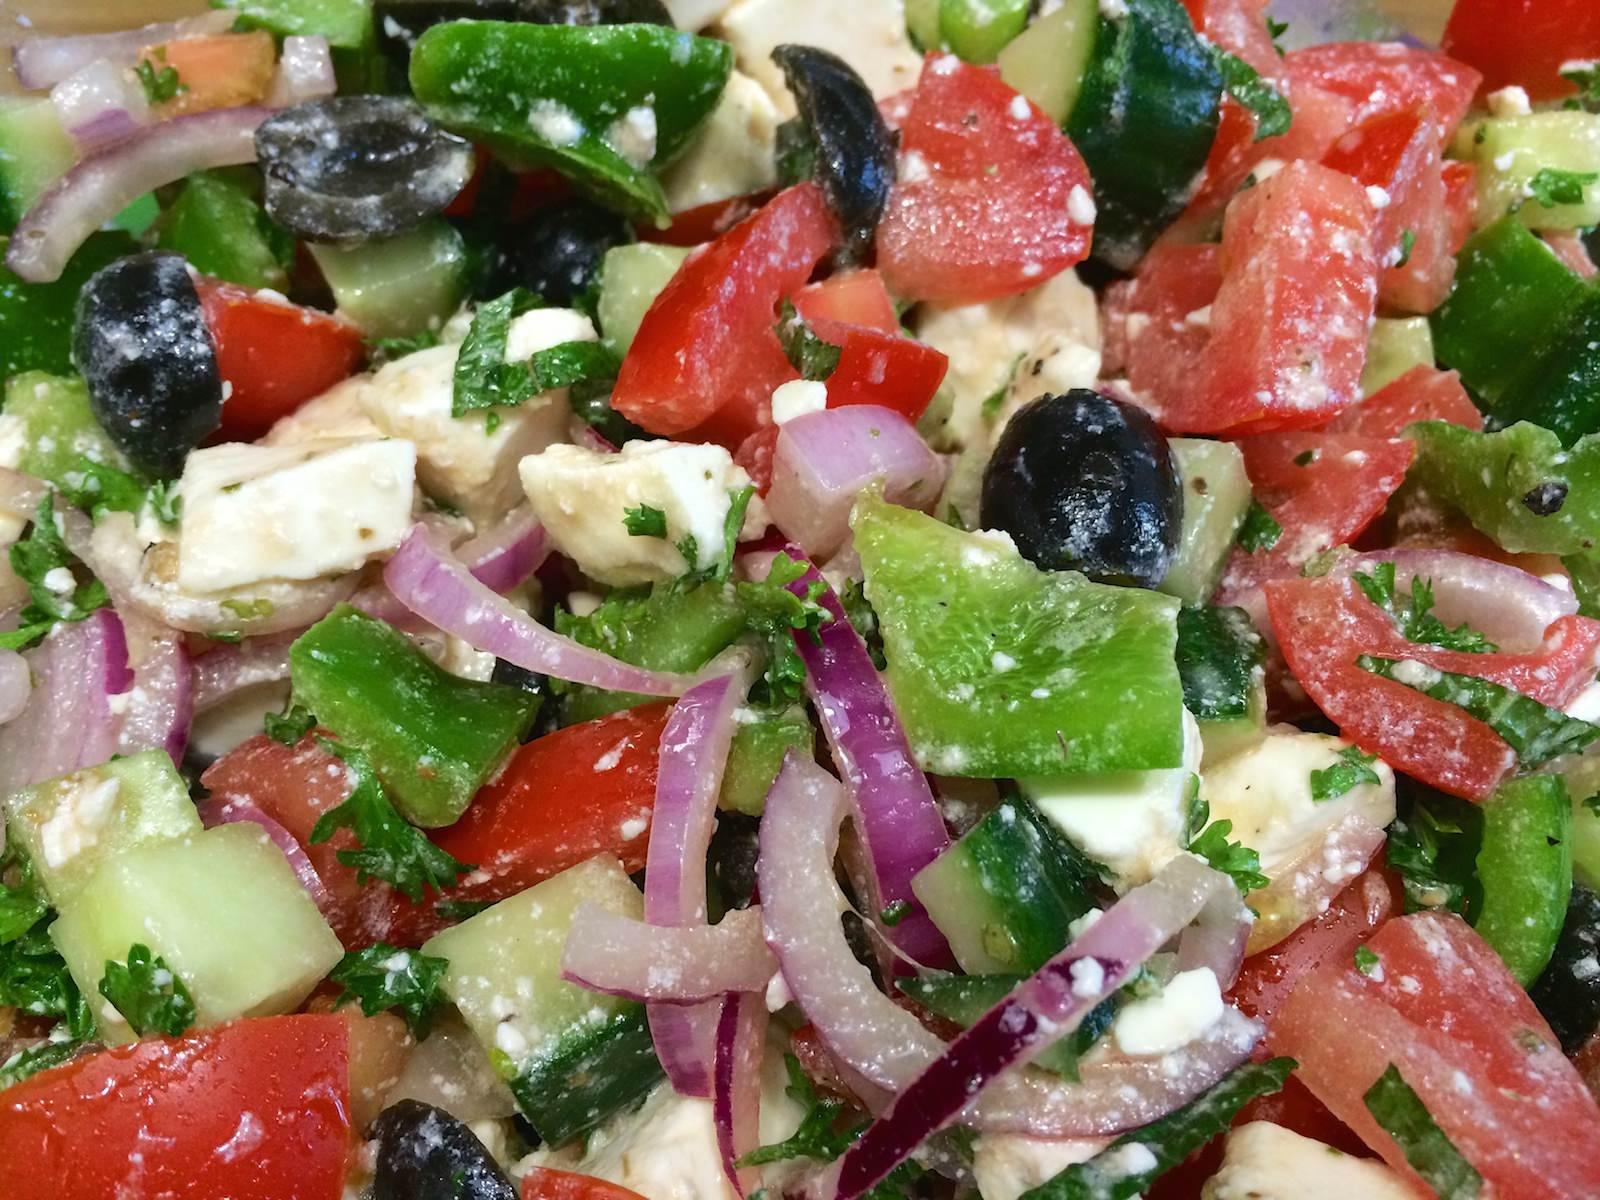 griekse salade origineel grieks recept. Black Bedroom Furniture Sets. Home Design Ideas